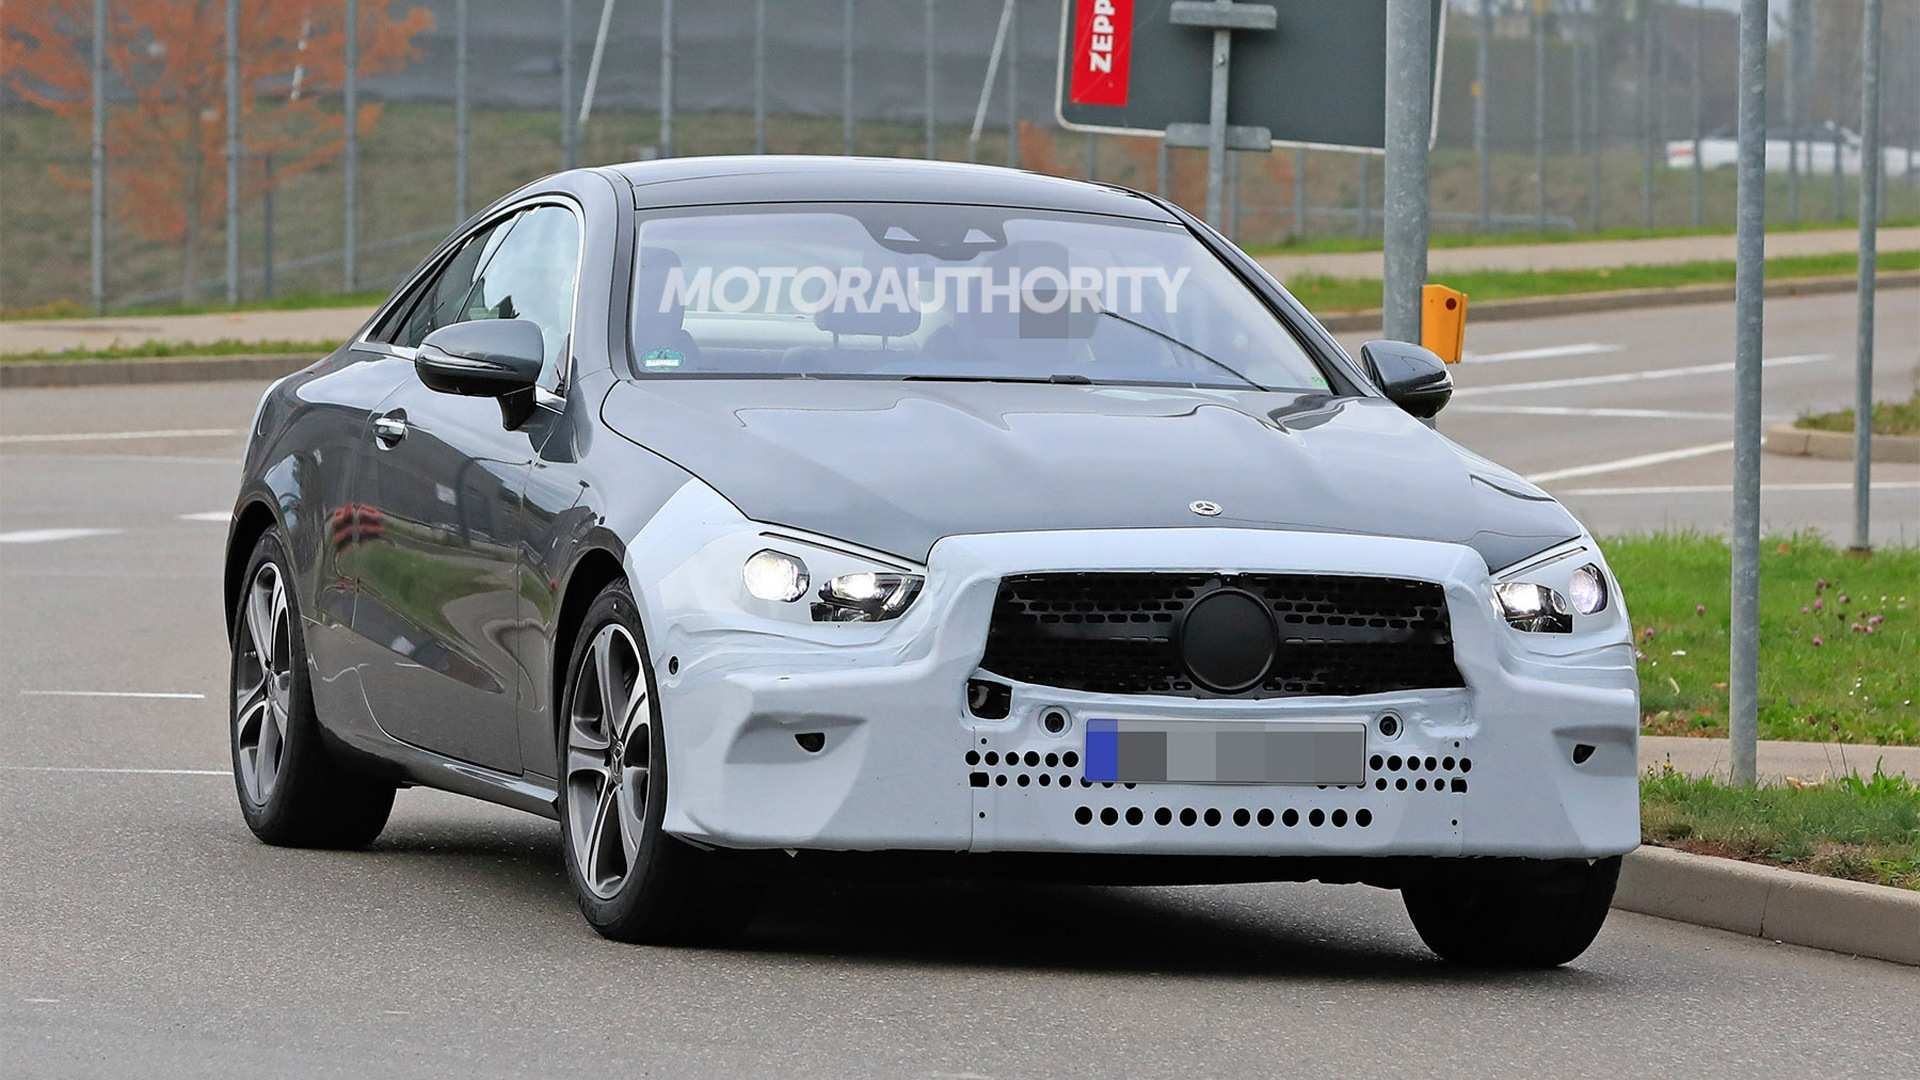 30 All New Spy Shots 2020 Mercedes E Class Spesification by Spy Shots 2020 Mercedes E Class